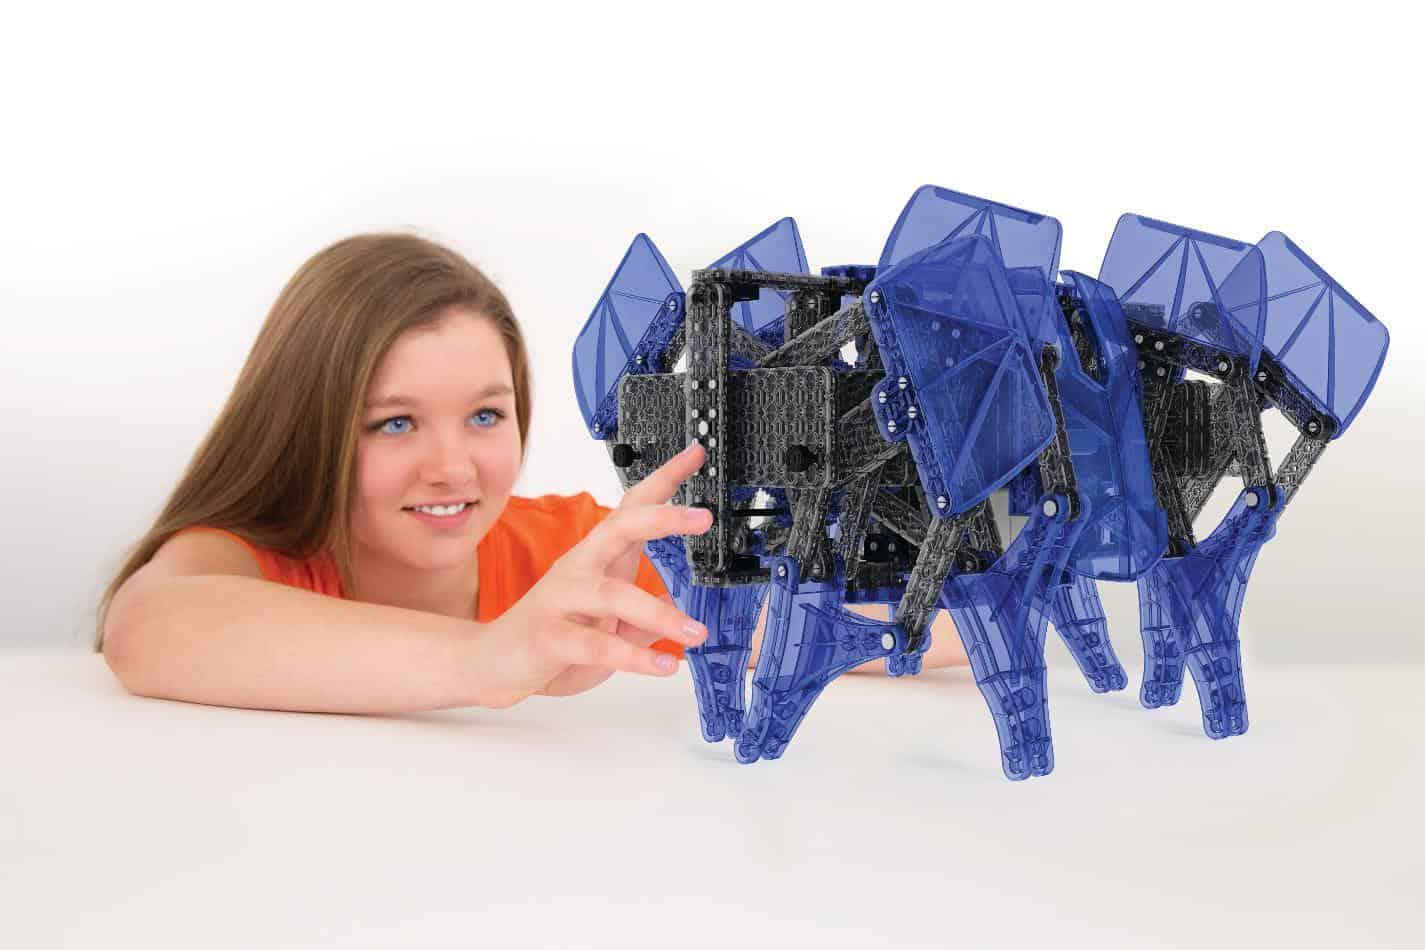 VEX Robotics Strandbeast From Hexbug